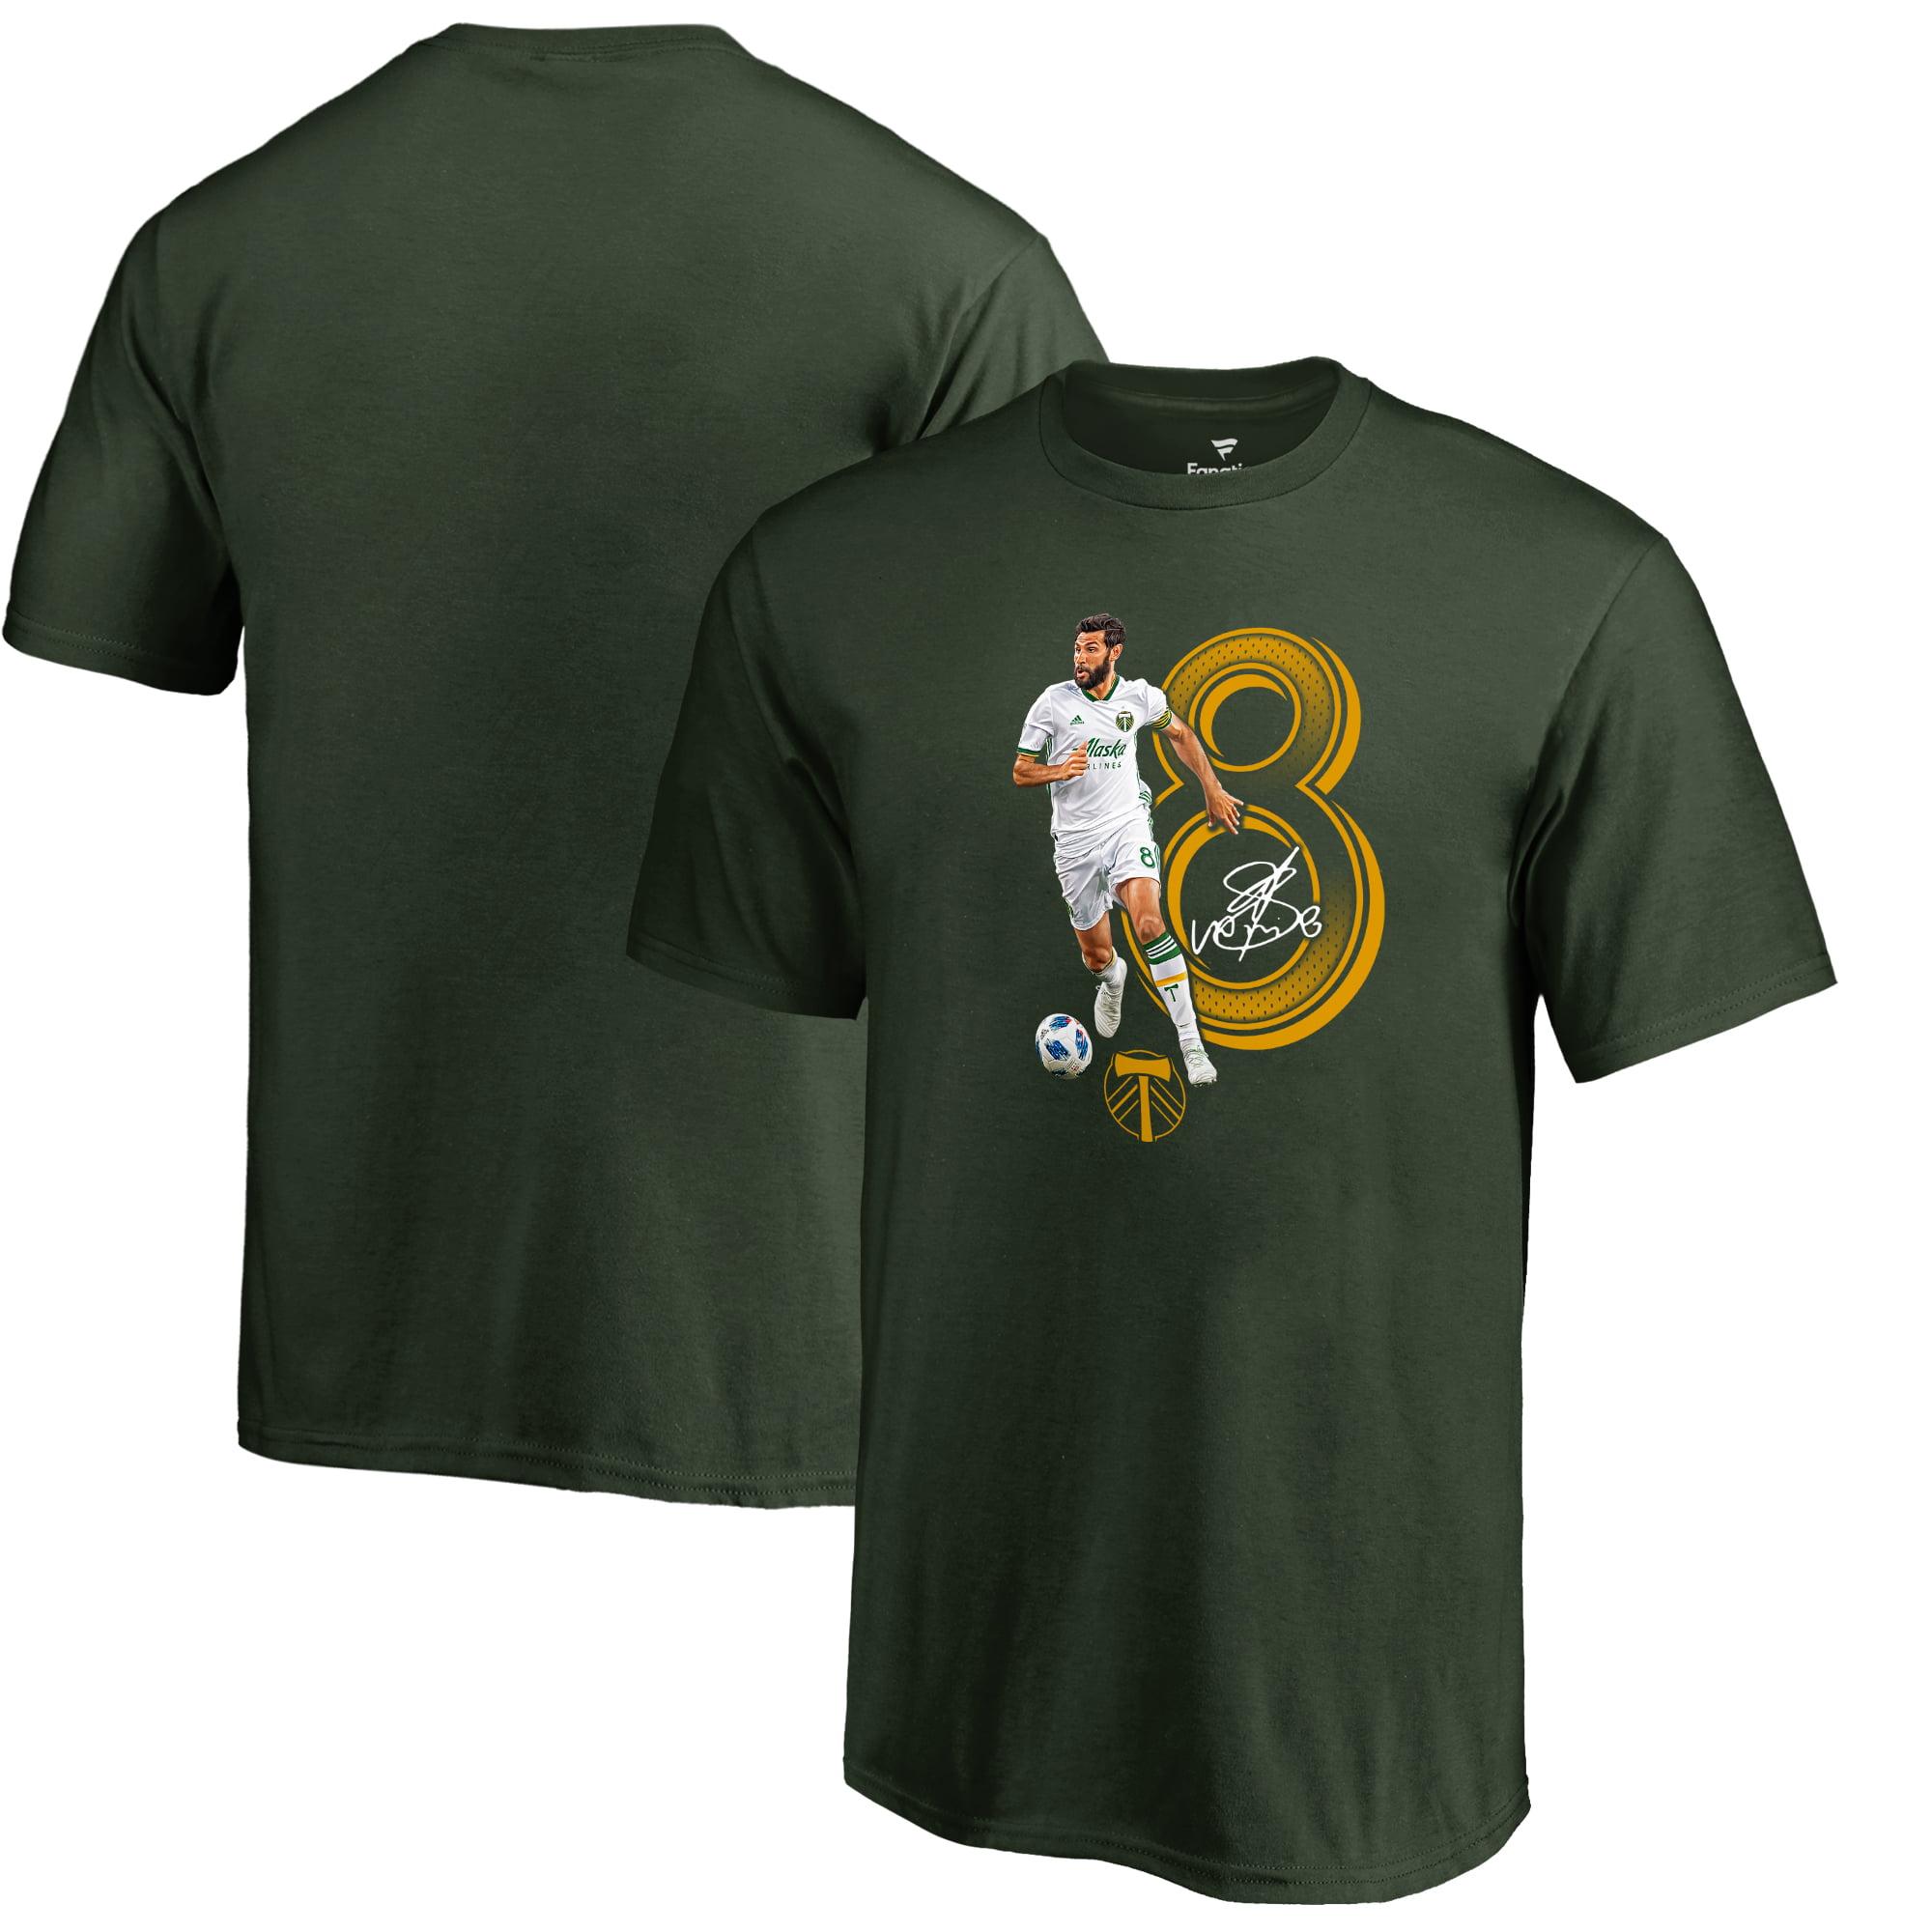 Diego Valeri Portland Timbers Fanatics Branded Youth Powerhouse Player T-Shirt - Green